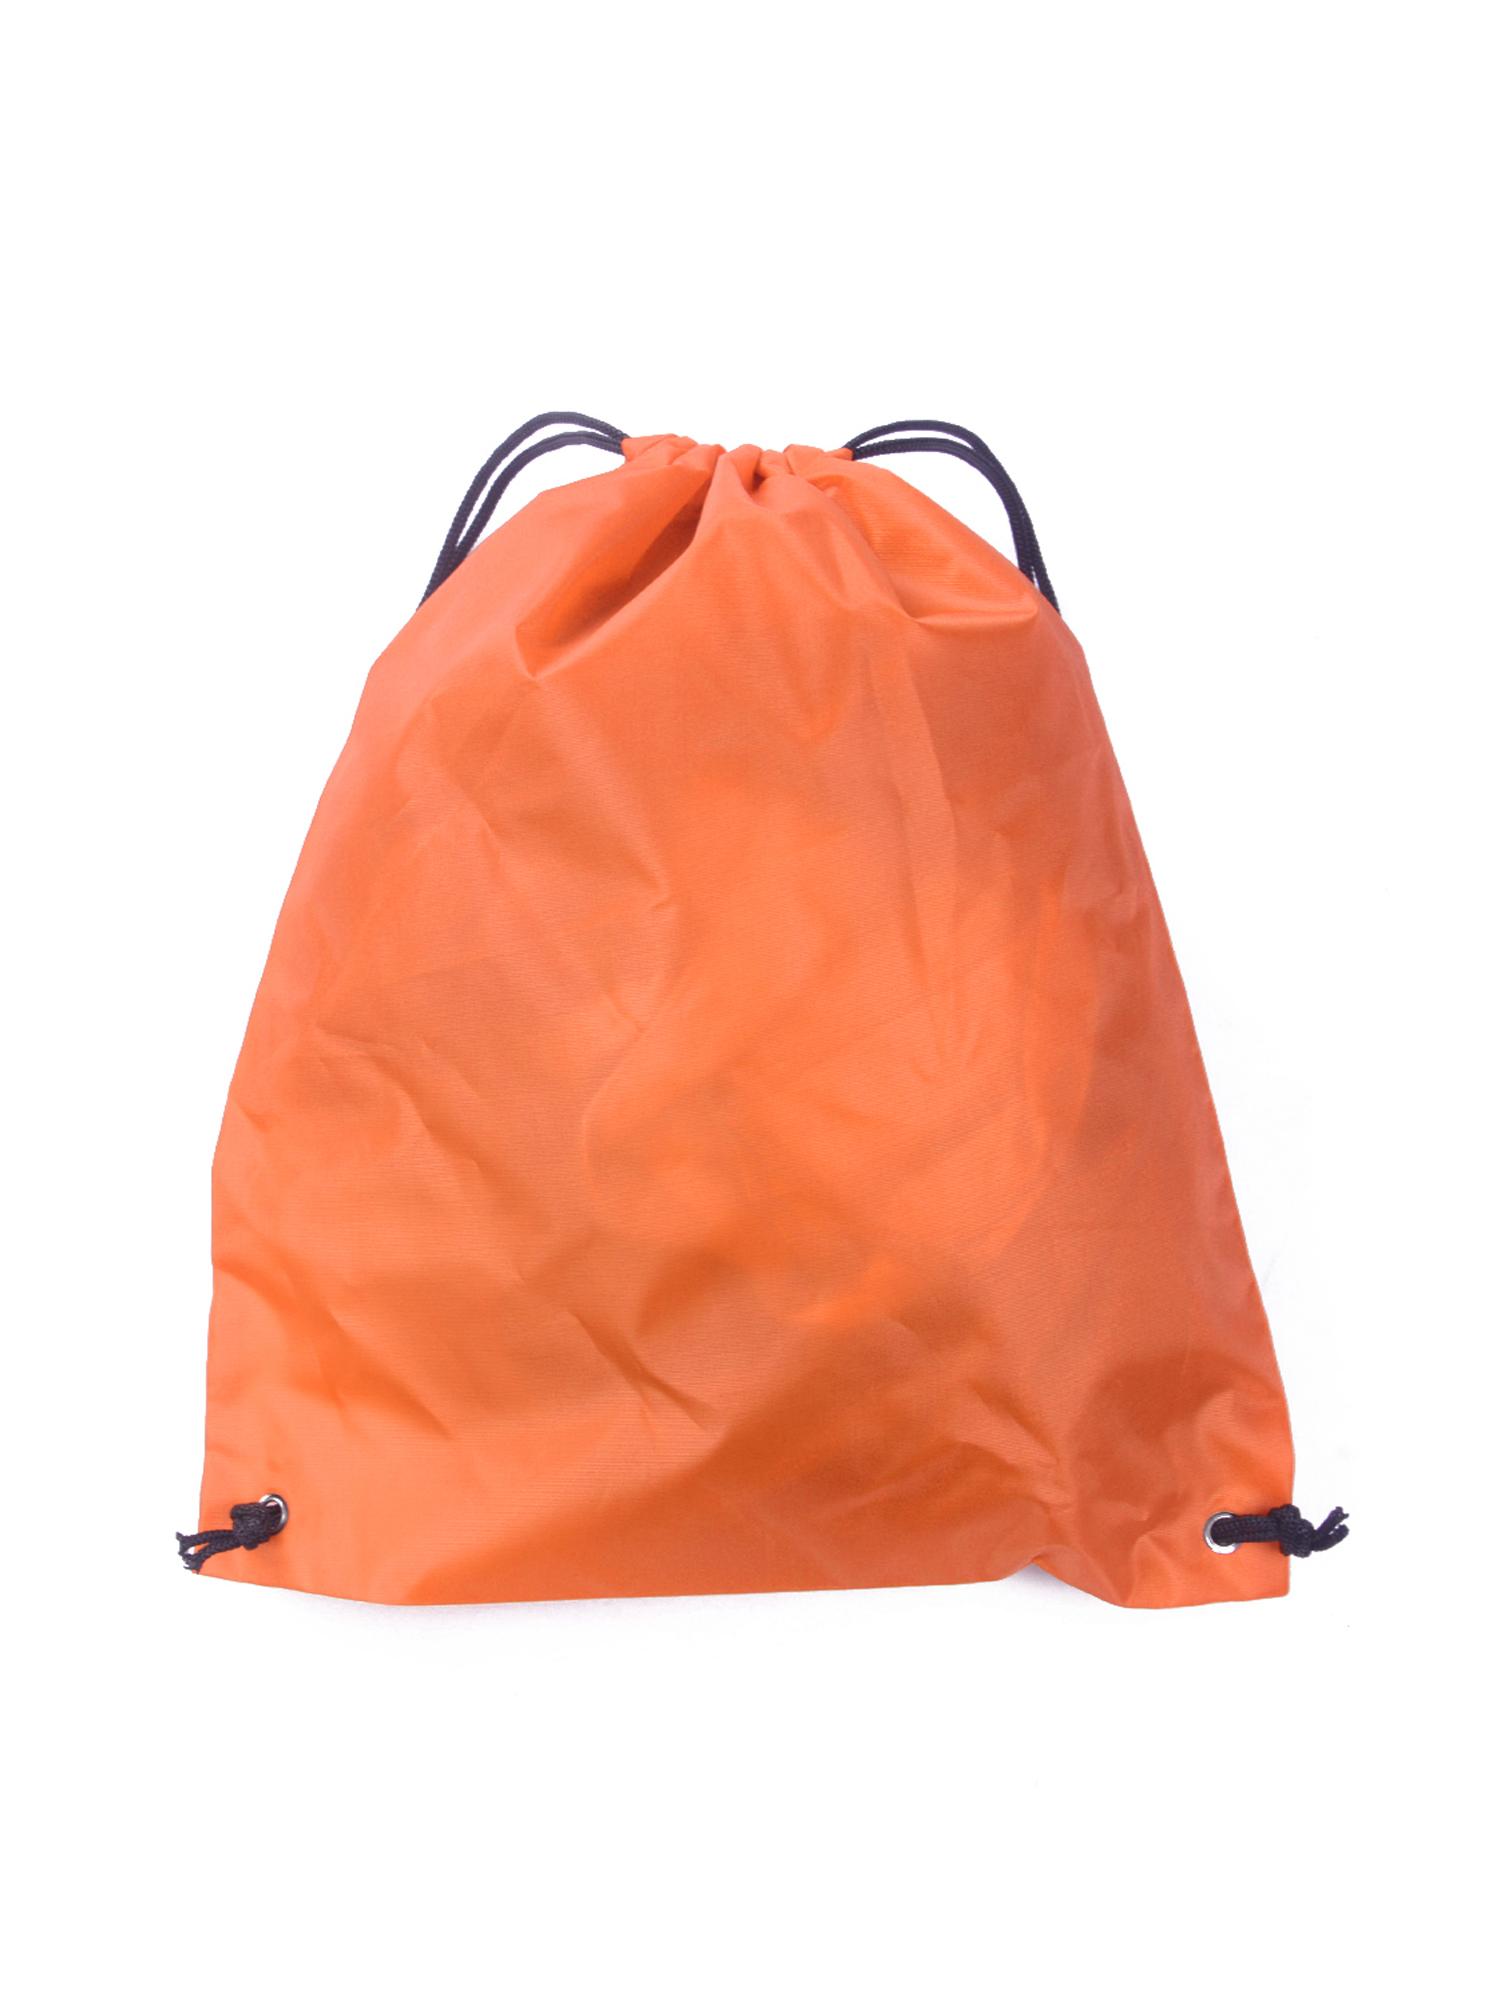 book bag video games lunch bag 40cm Retro Video Game Design Drawstring Bag